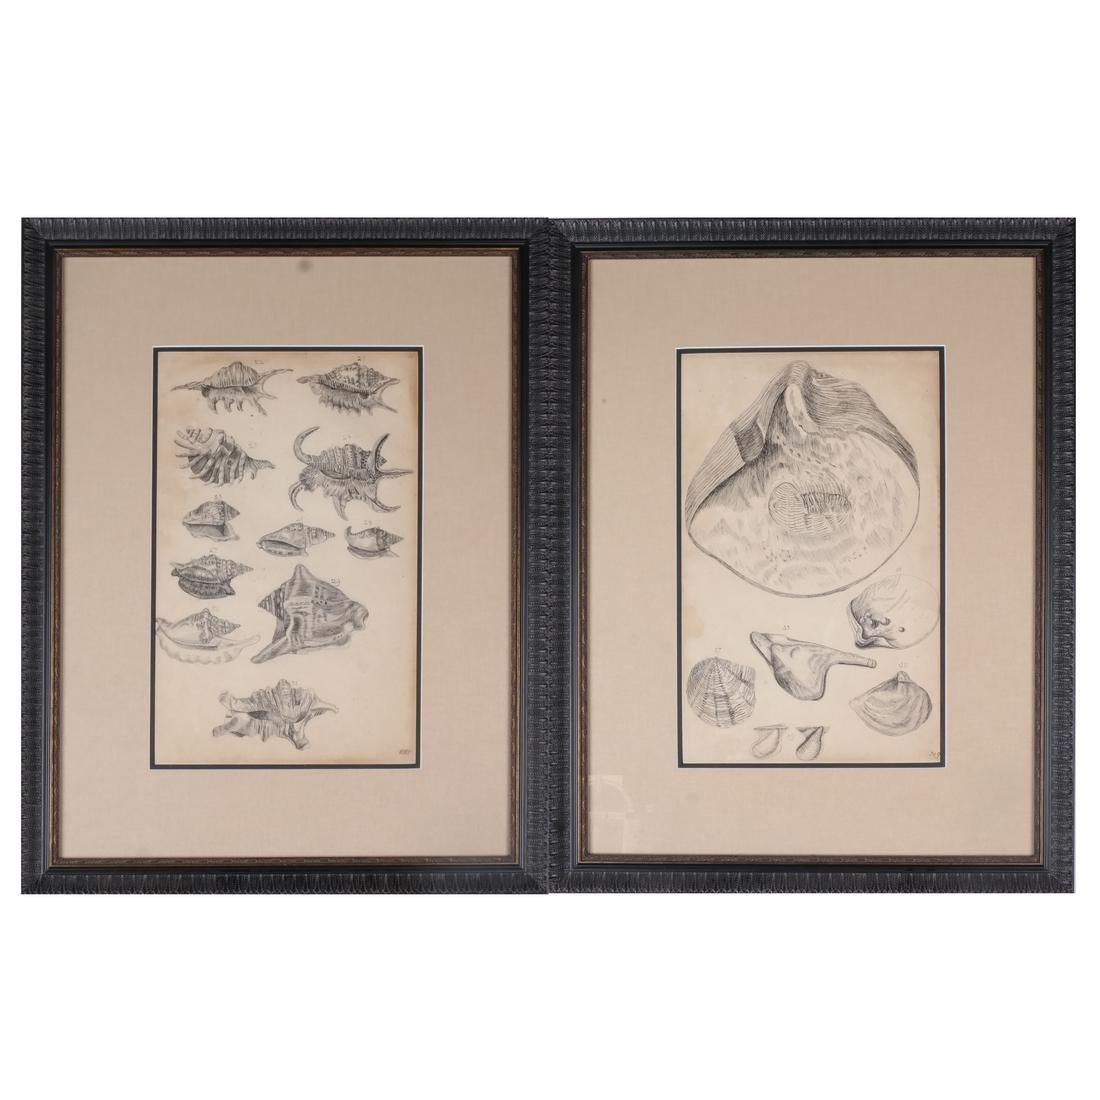 Two Shell Life Framed Prints Italian 18th Century